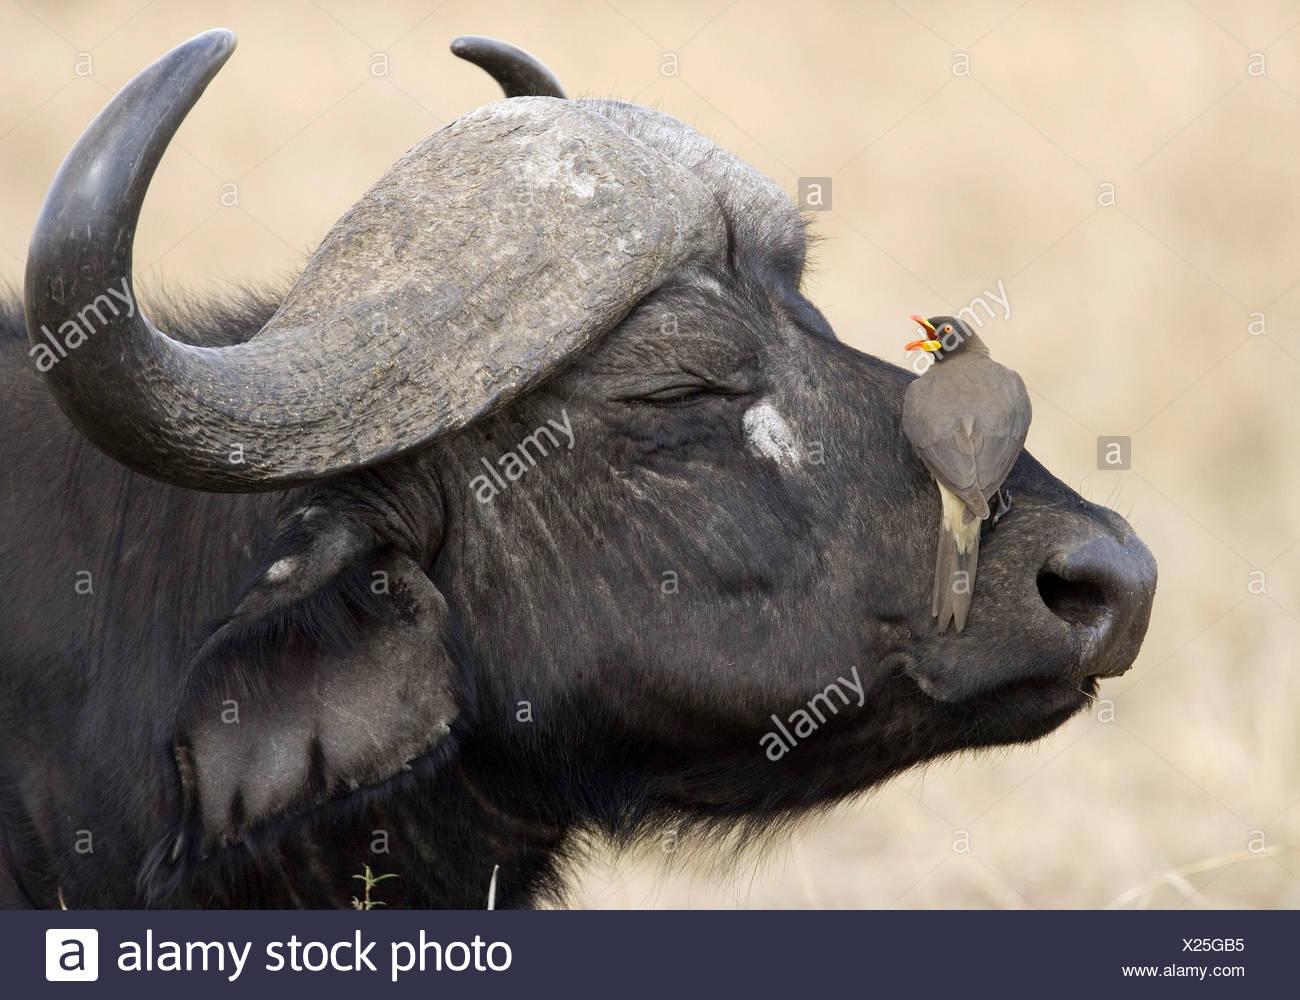 zoology / animals, mammal / mammalian, Bovidae, African Buffalo (Syncerus caffer), detail: head, bird (Yellow-billed Oxpecker) sitting on mouth, Masai Mara, Kenya, distribution: Africa, Additional-Rights-Clearance-Info-Not-Available Stock Photo